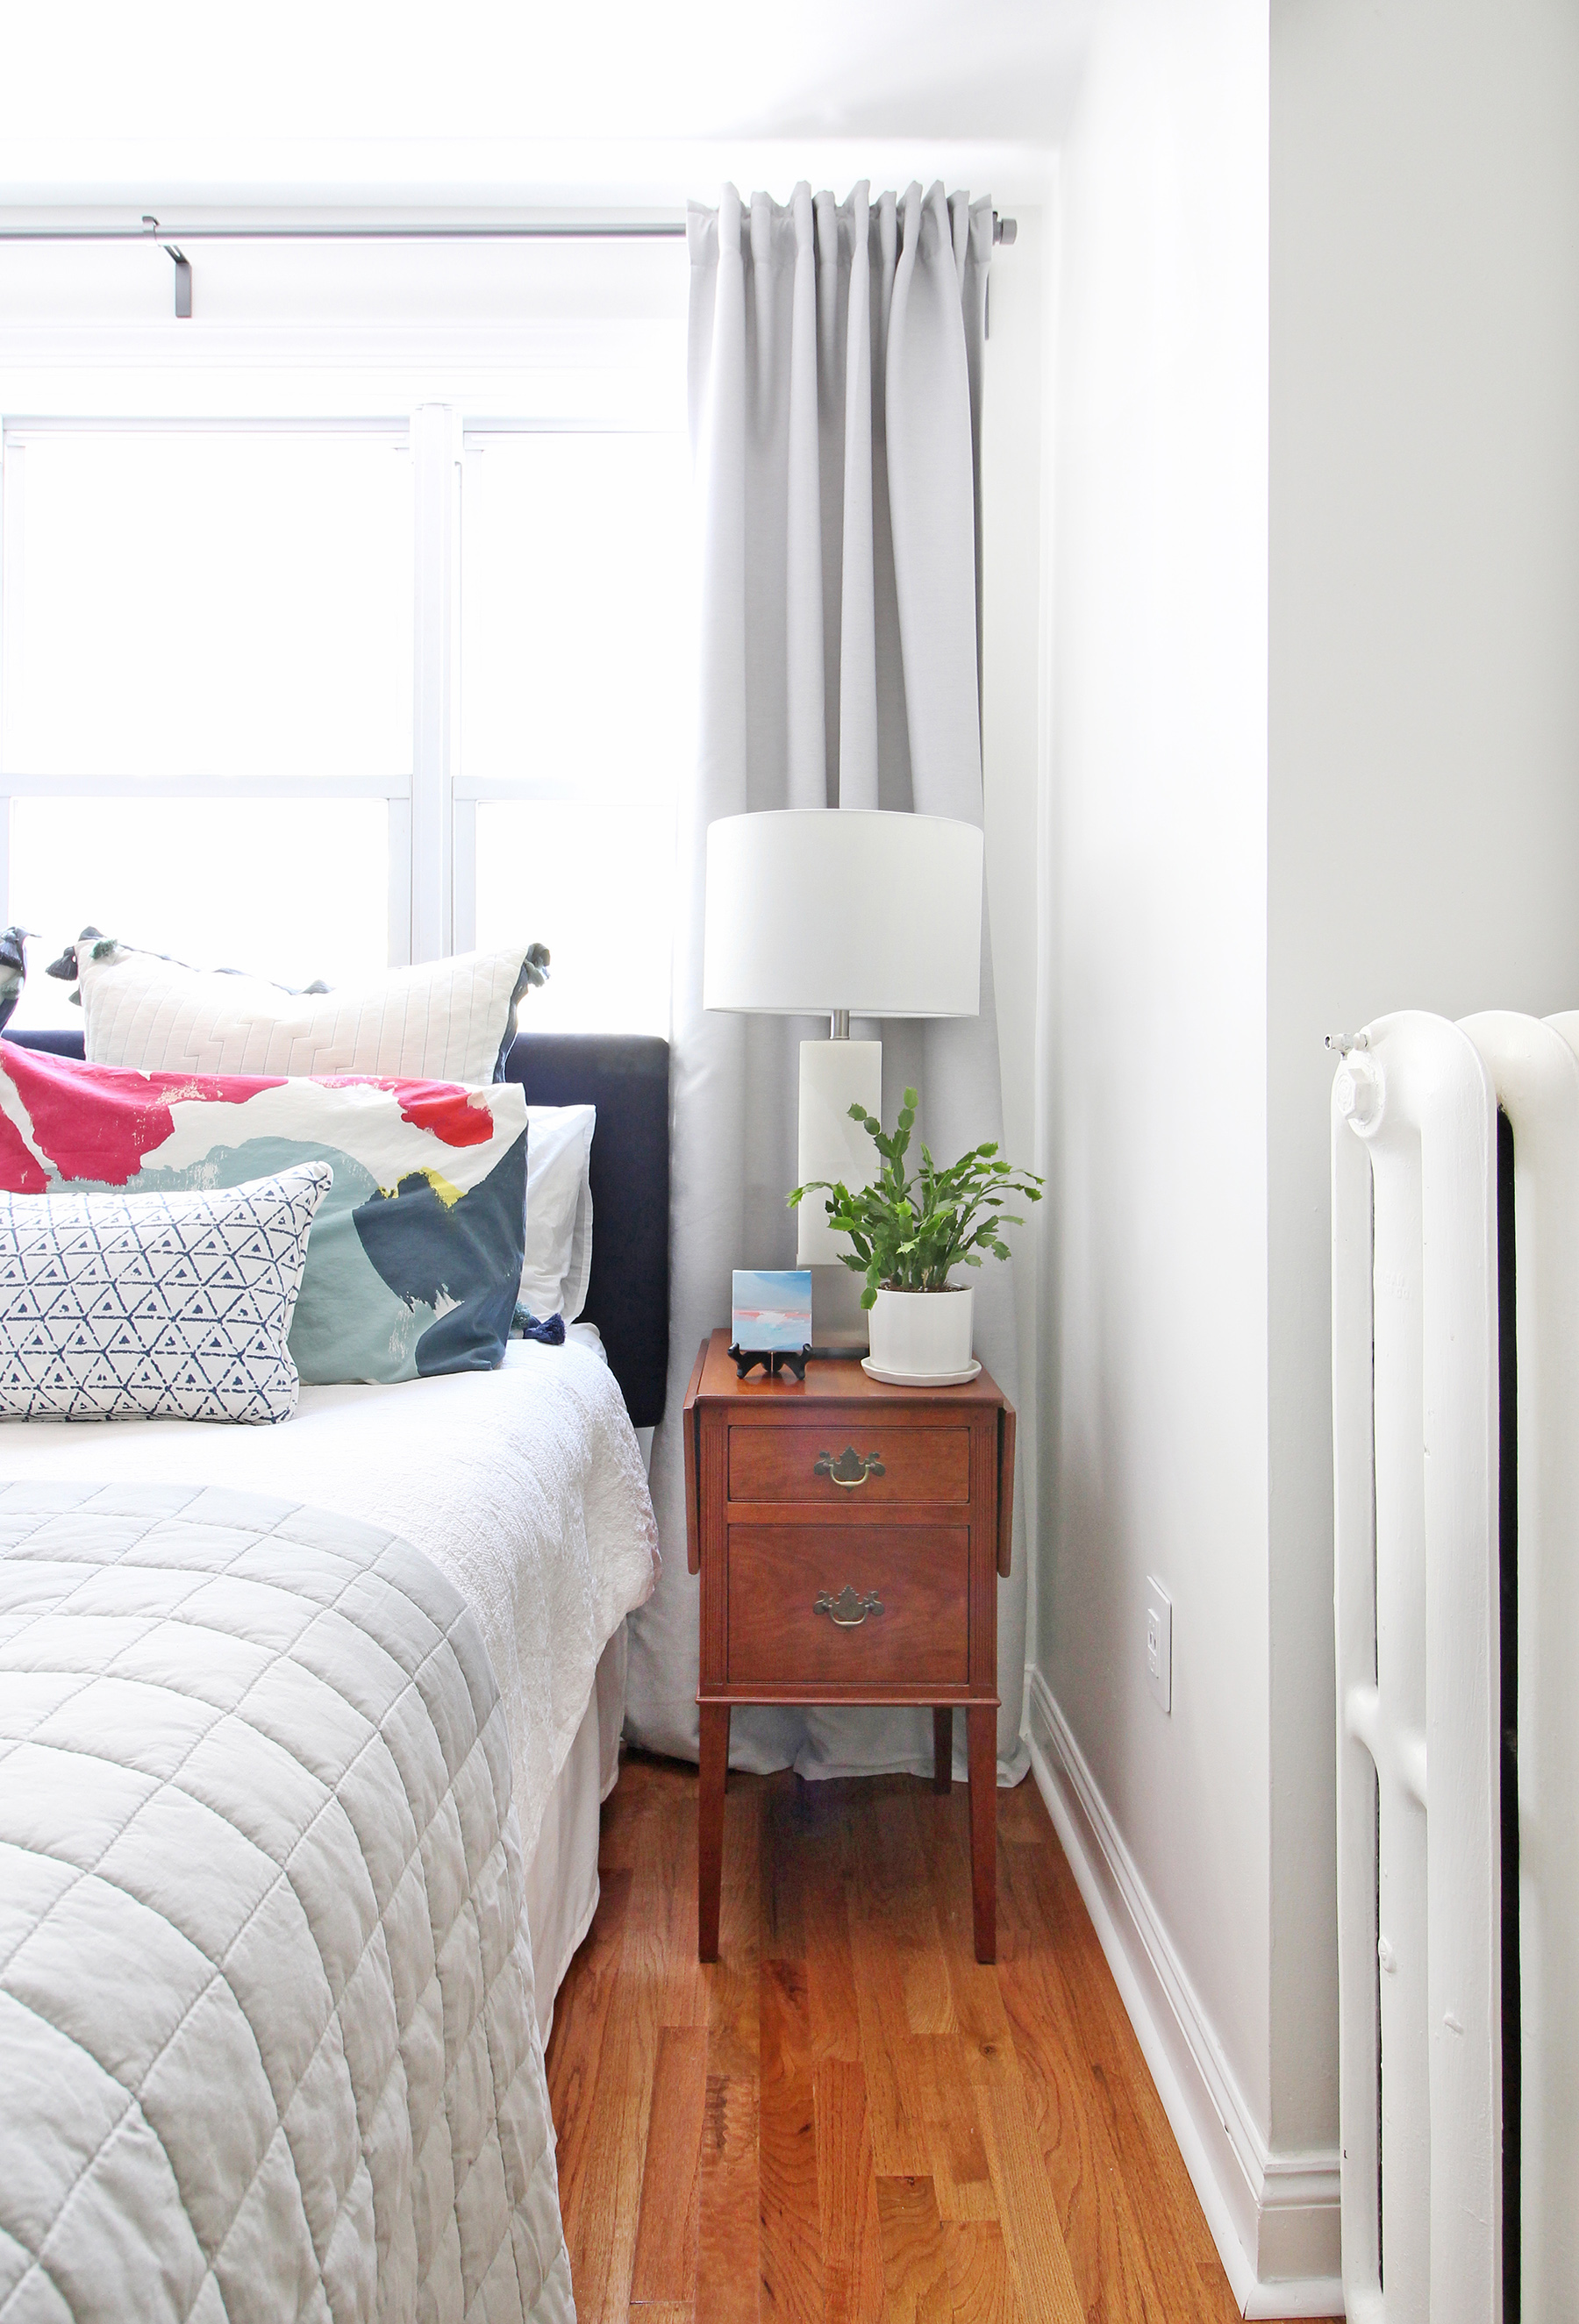 Modern-Eclectic-Bedroom-Refresh-Legrand-USB-Outlet-Web-8.jpg